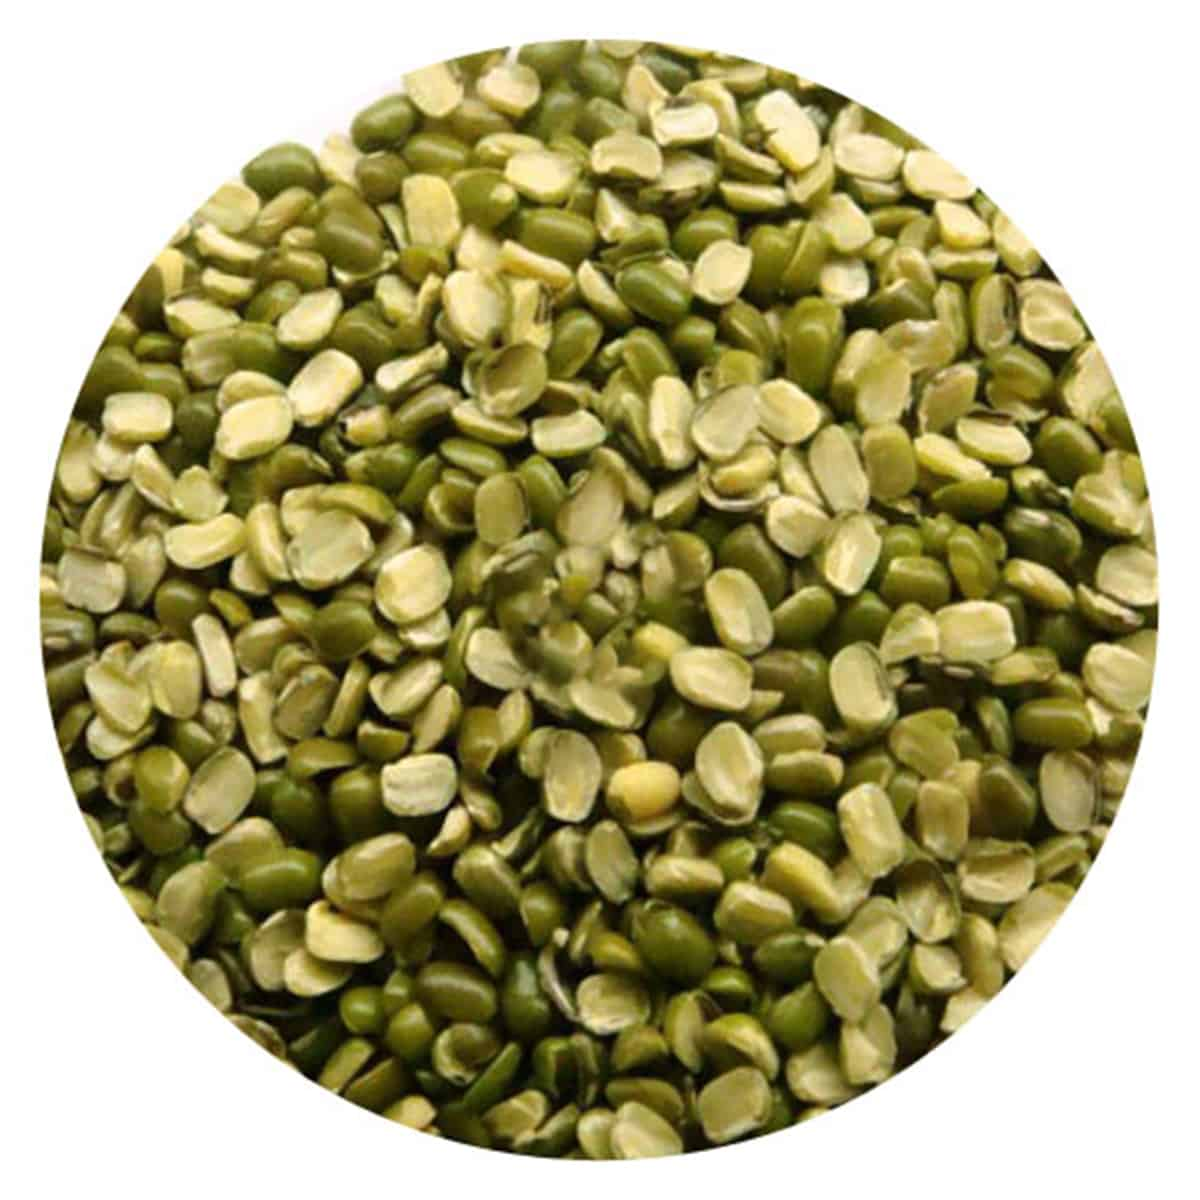 Buy IAG Foods Moong Dal Chilka (Split Green Gram with Skin) - 1 kg